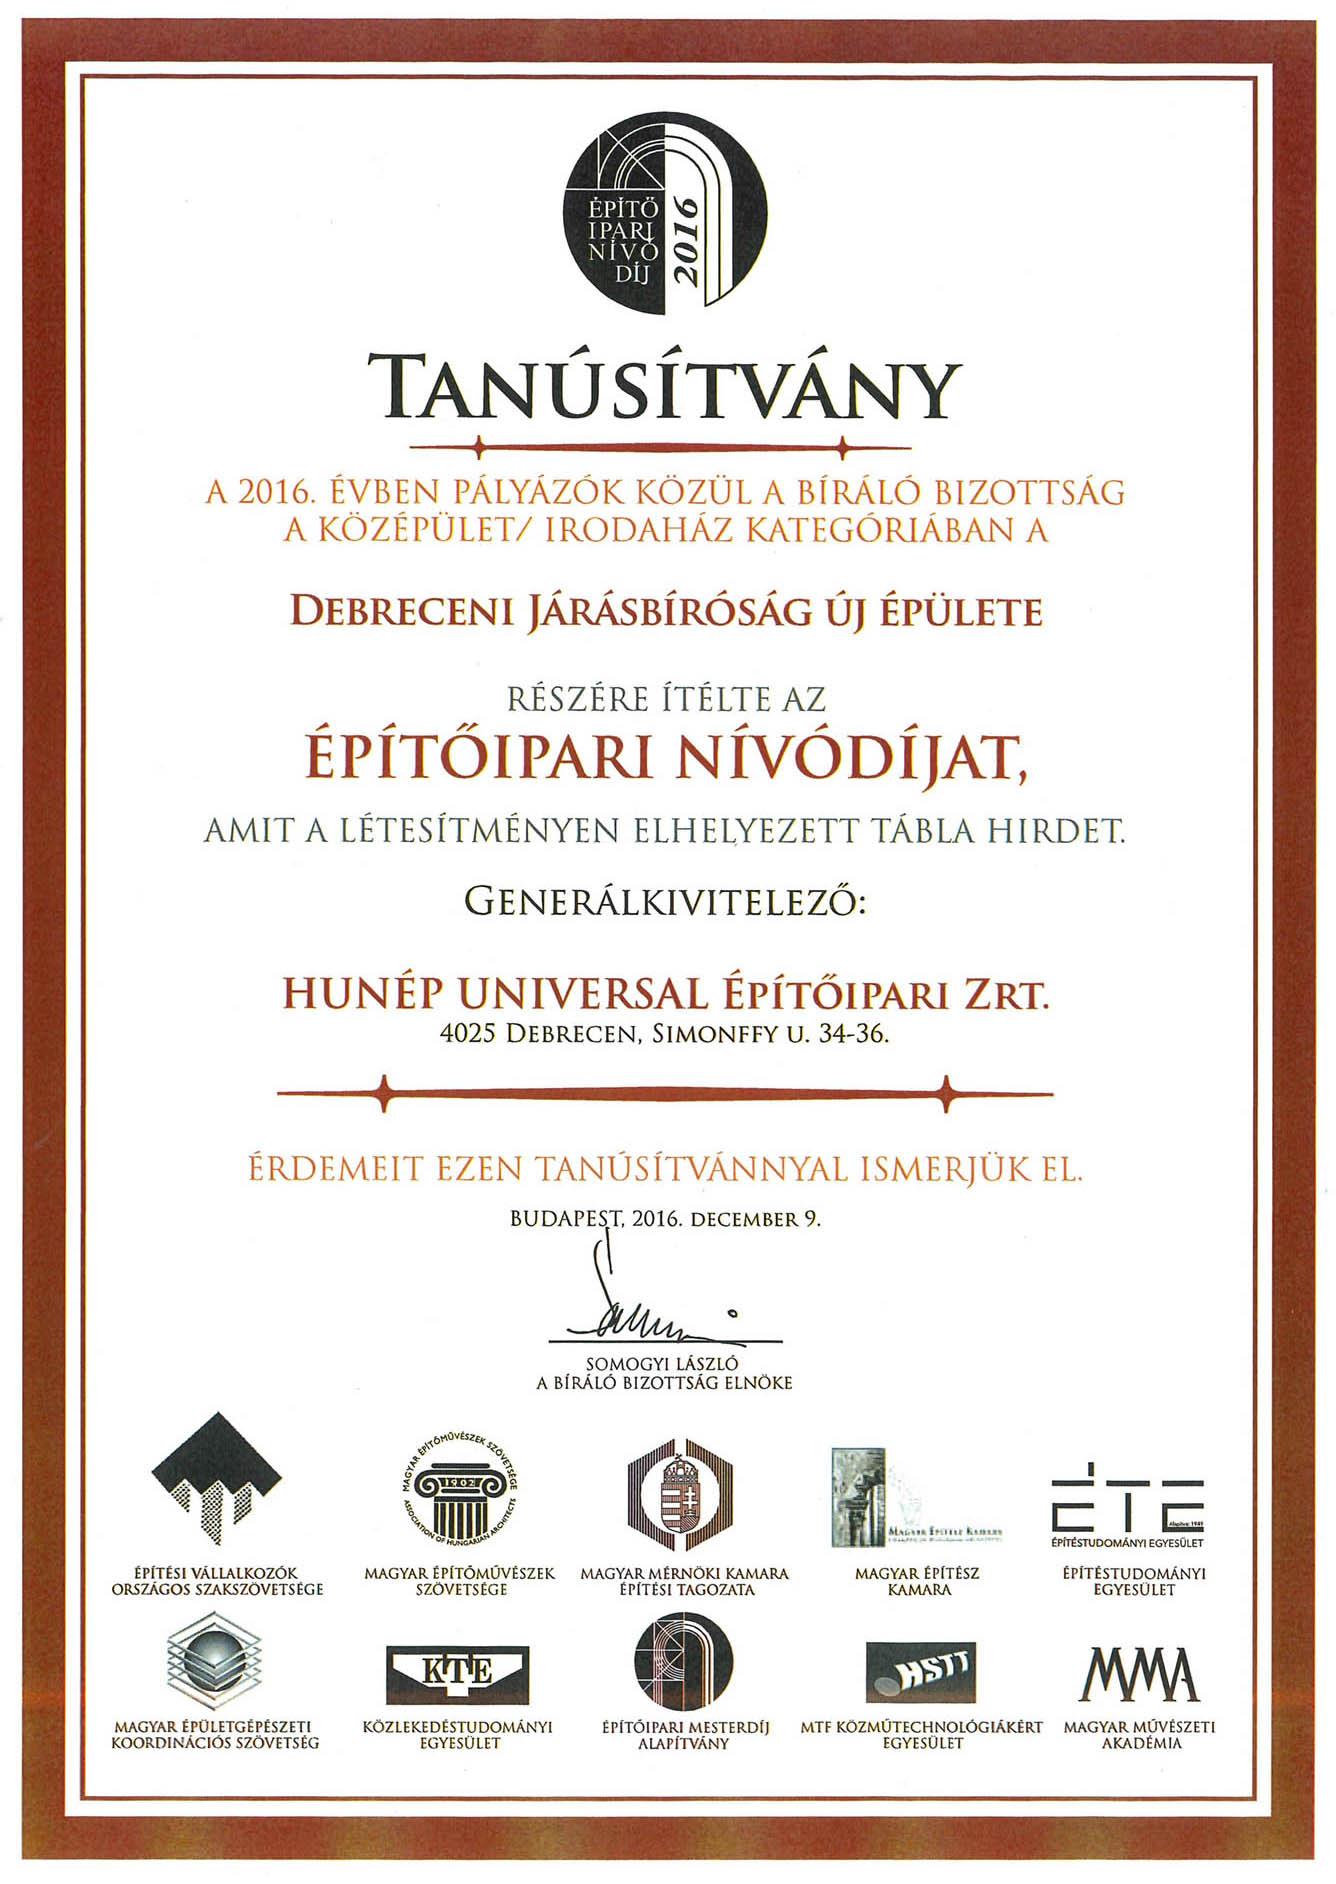 Debreceni Járásbíróság